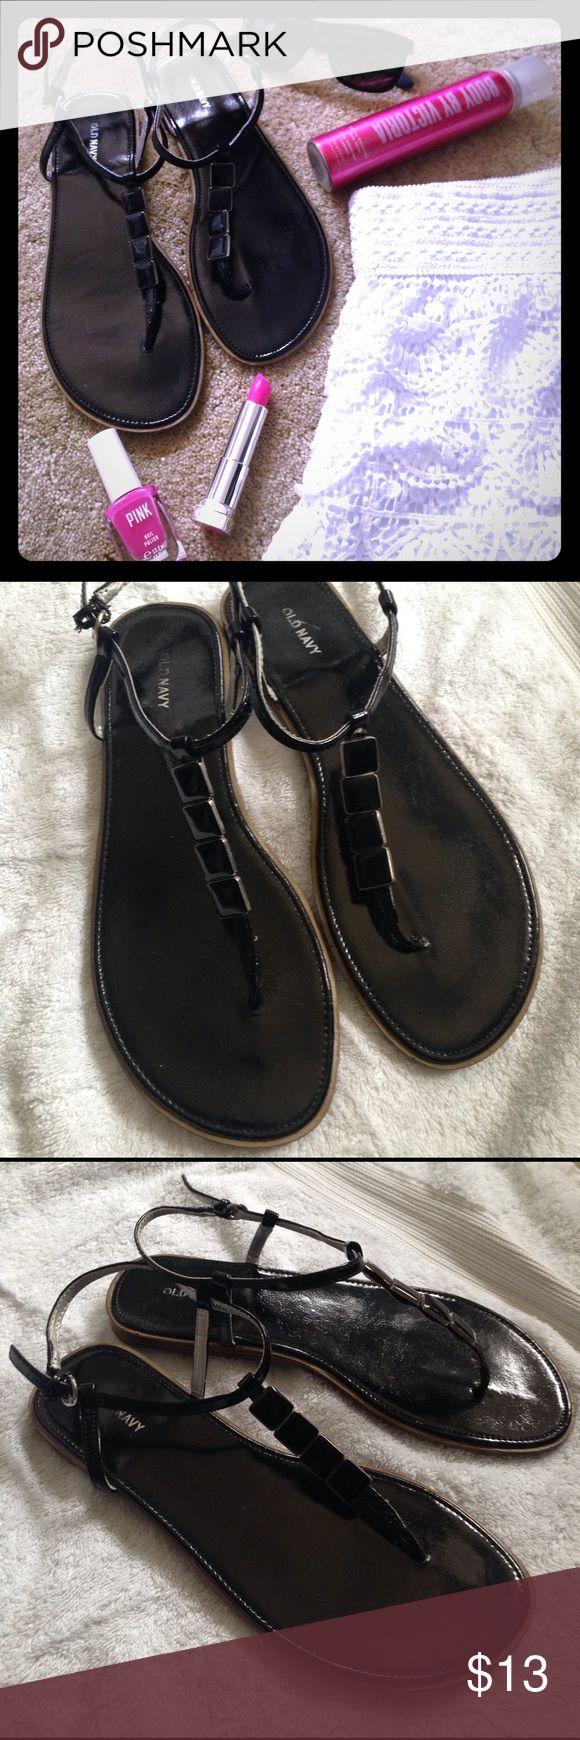 Black sandals old navy - Black Patent Old Navy Sandals With Gem Accent